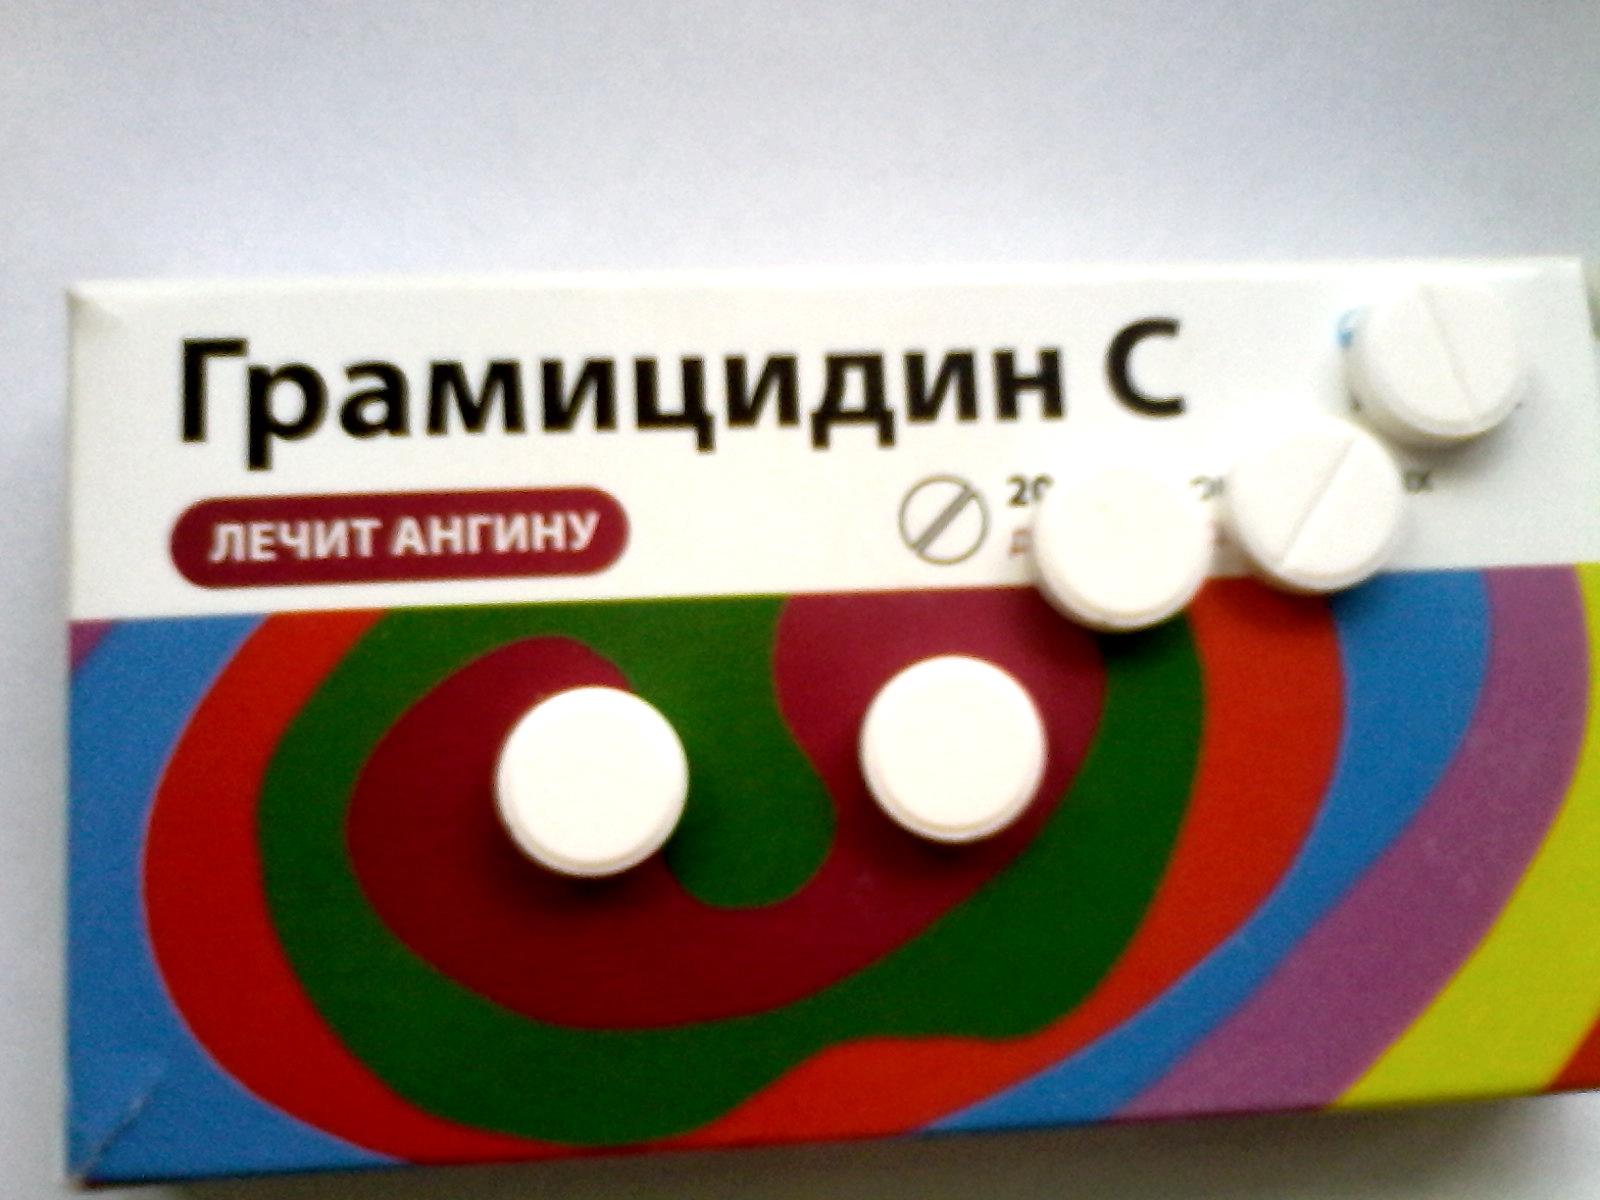 Граммидин таблетки